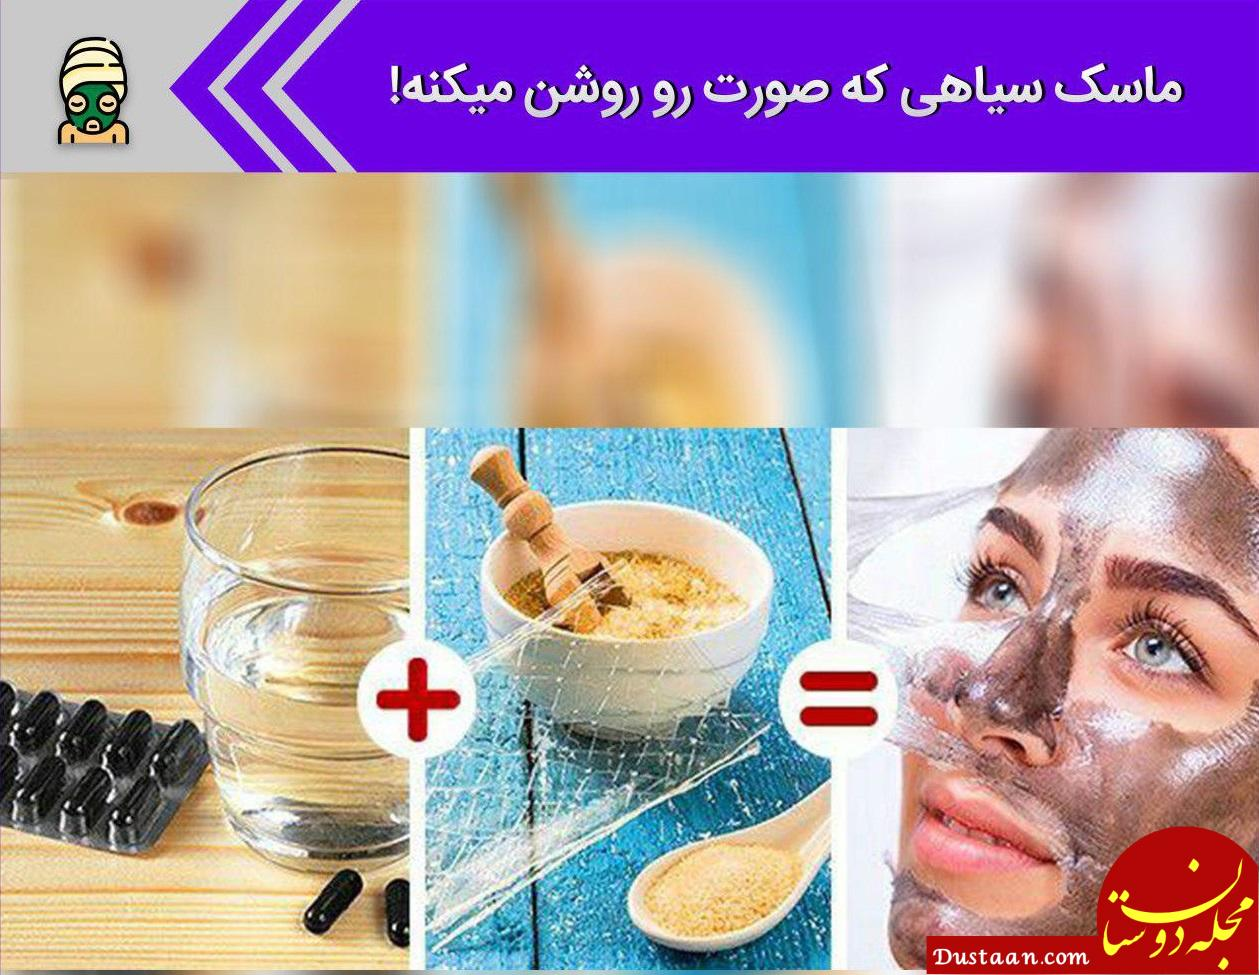 www.dustaan.com معرفی 25 ماسک جادویی برای جوان سازی و زیباسازی پوست